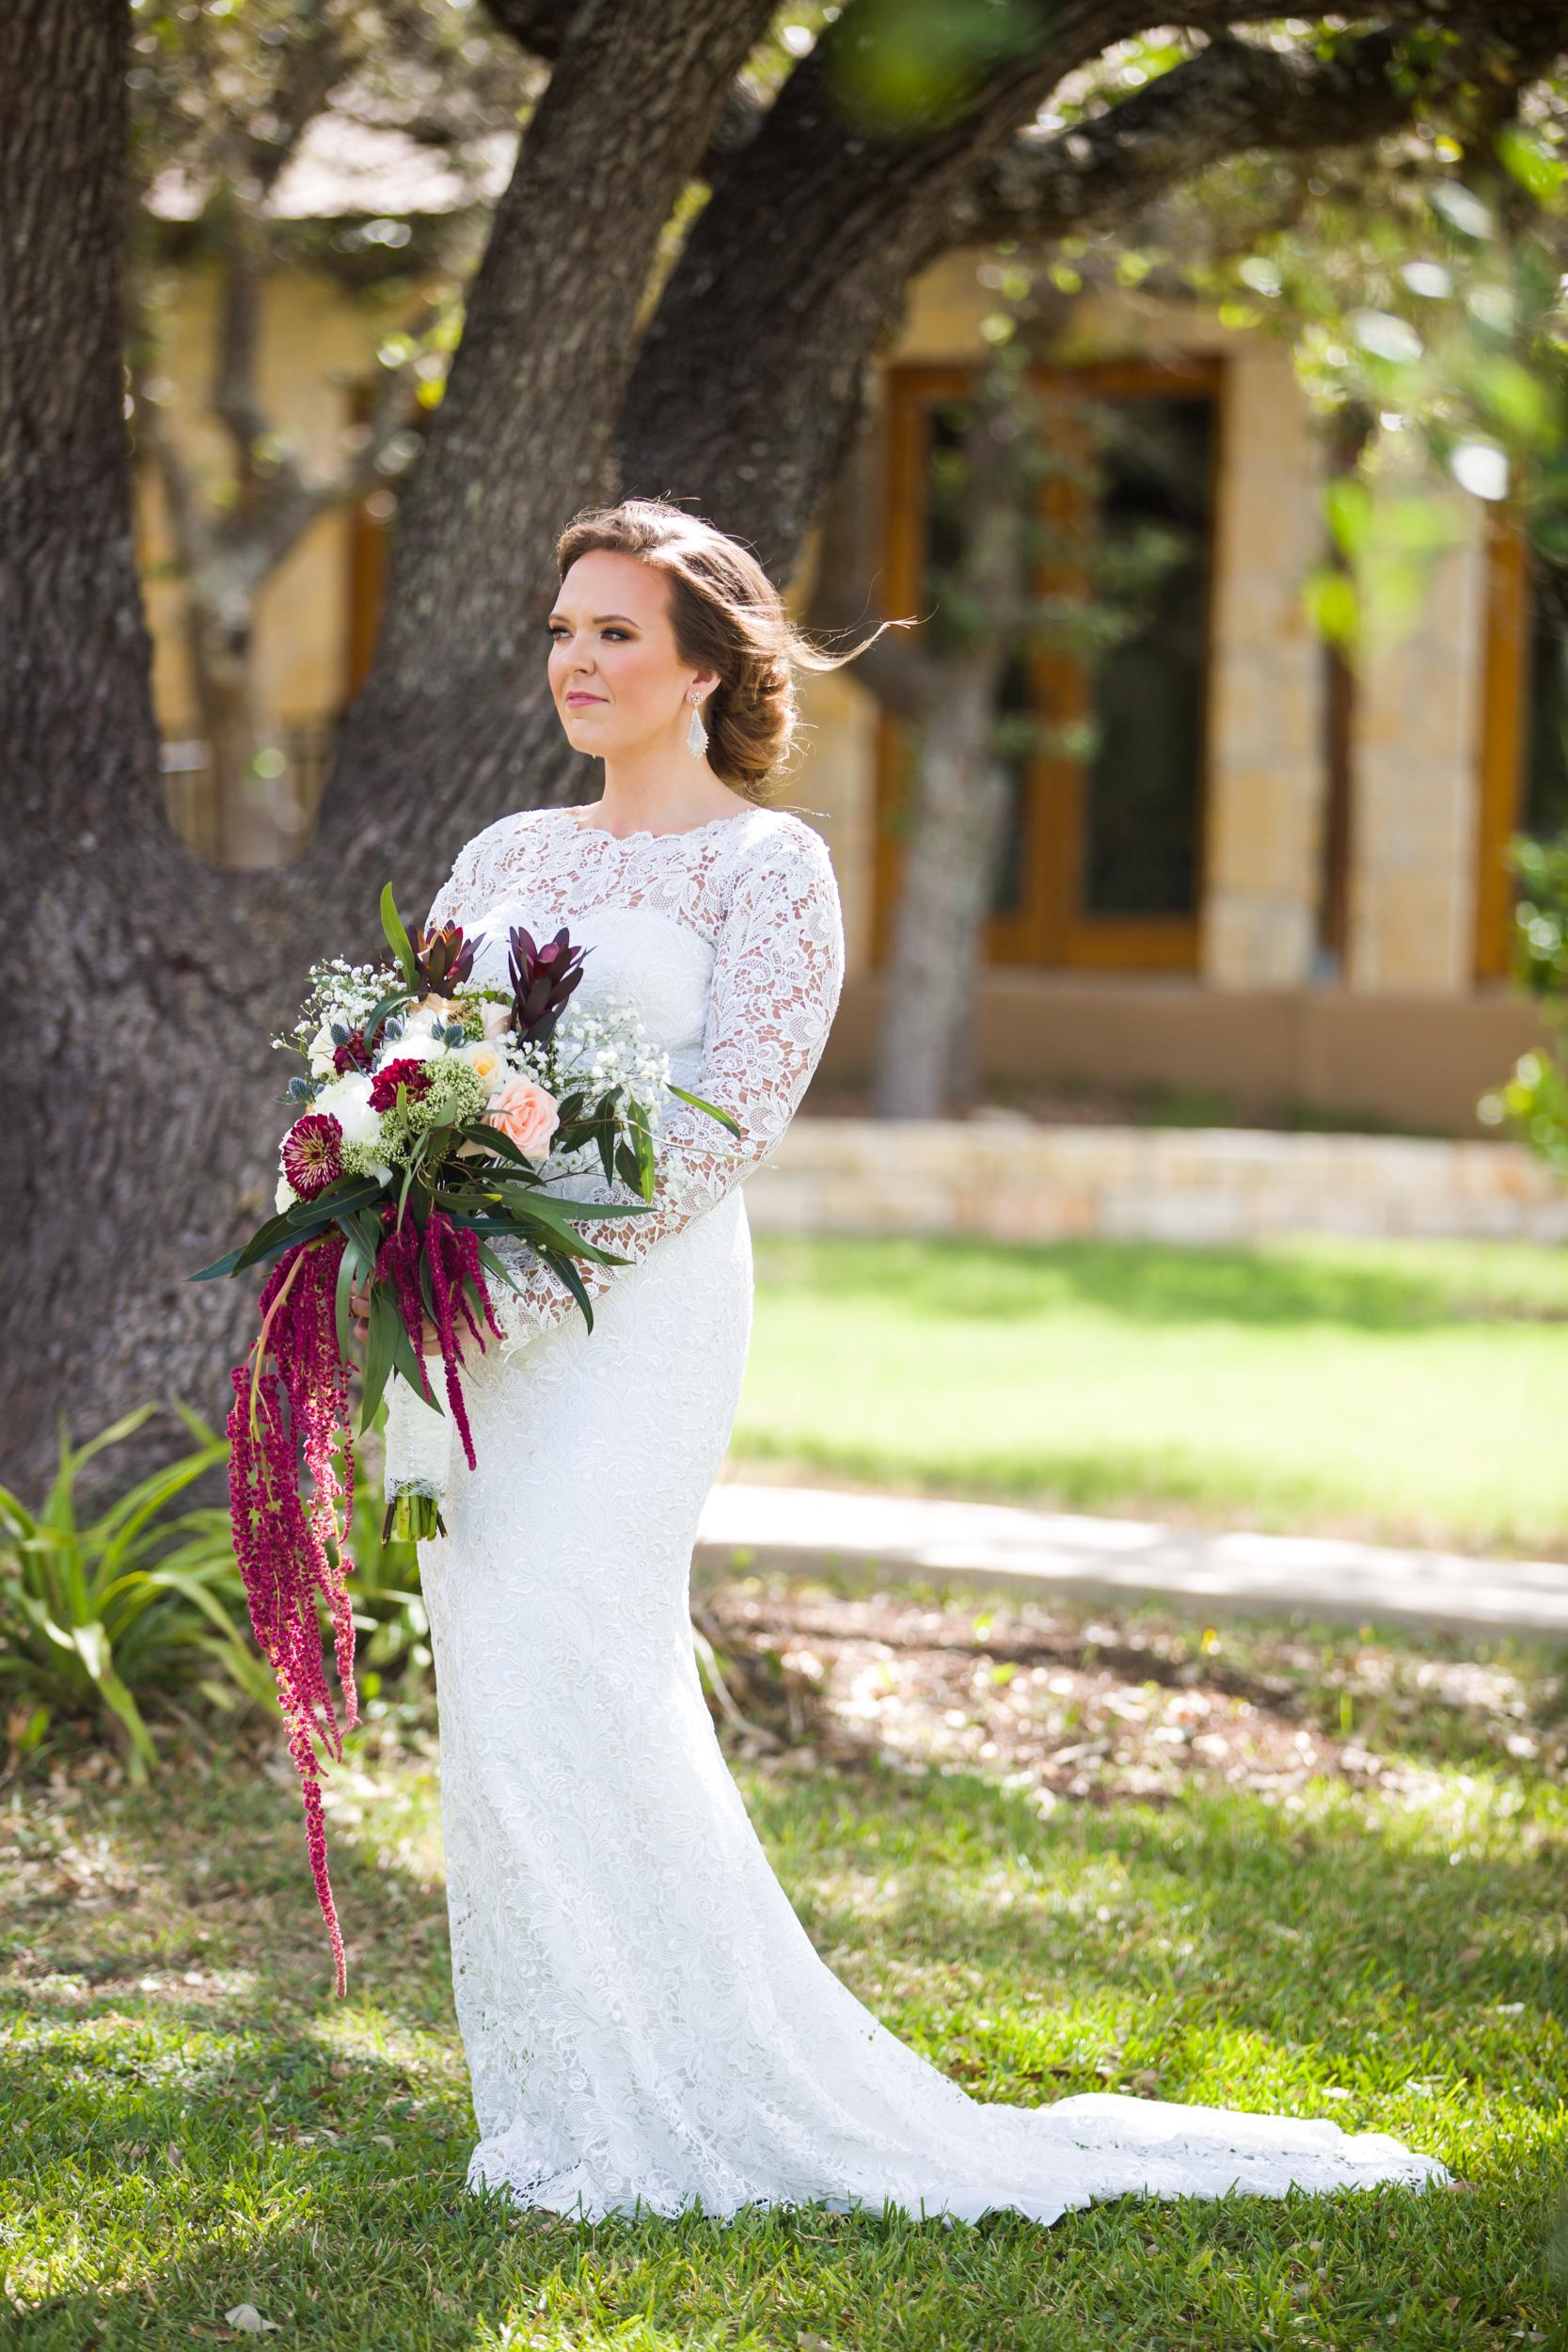 austin-wedding-colorful-14.jpg